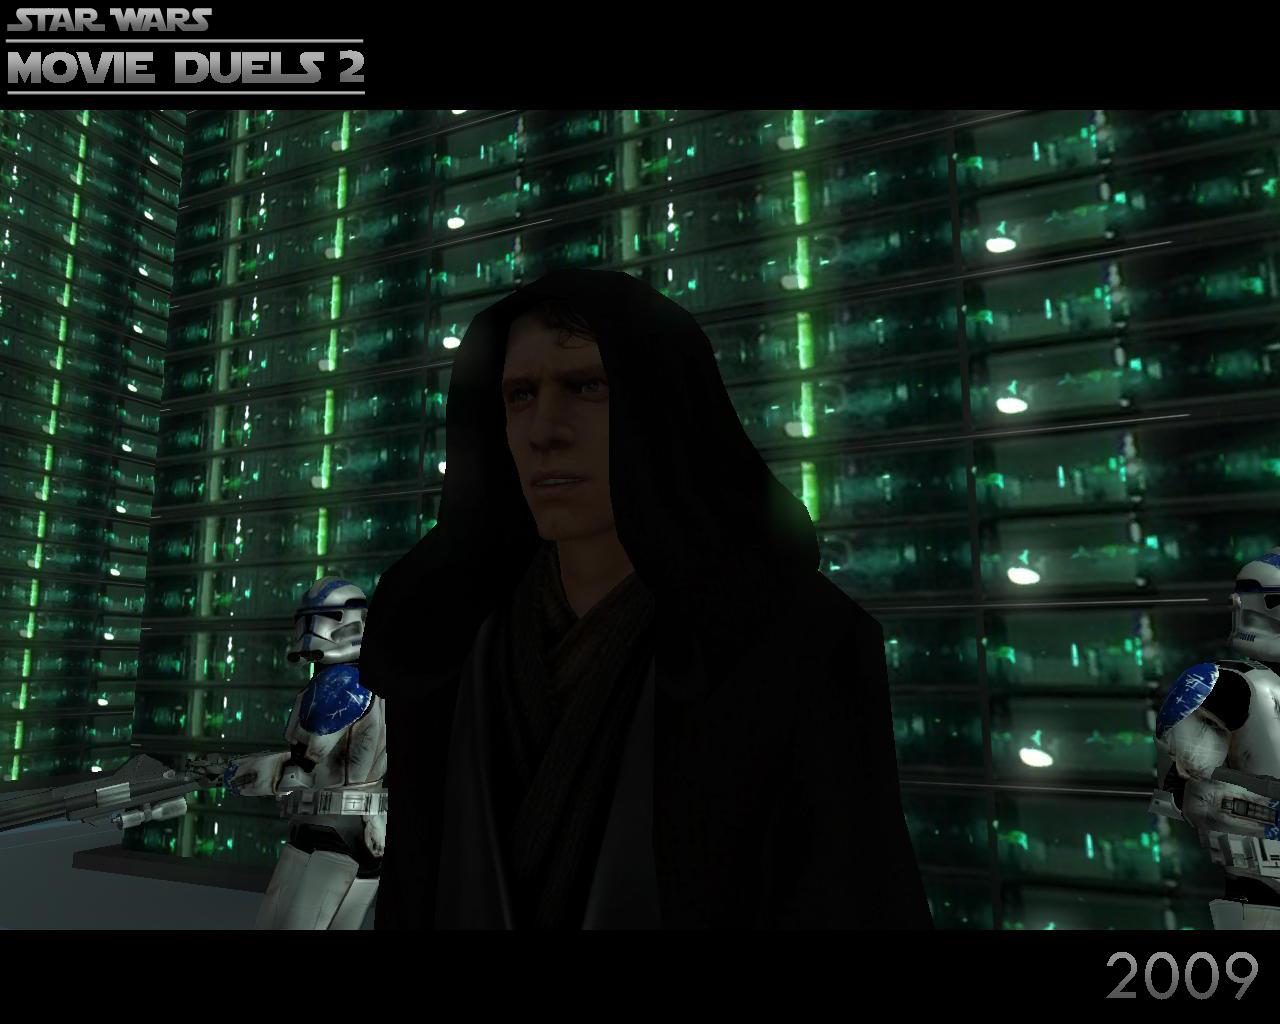 Attack On The Jedi Temple - Episode 3 image - Mod DB